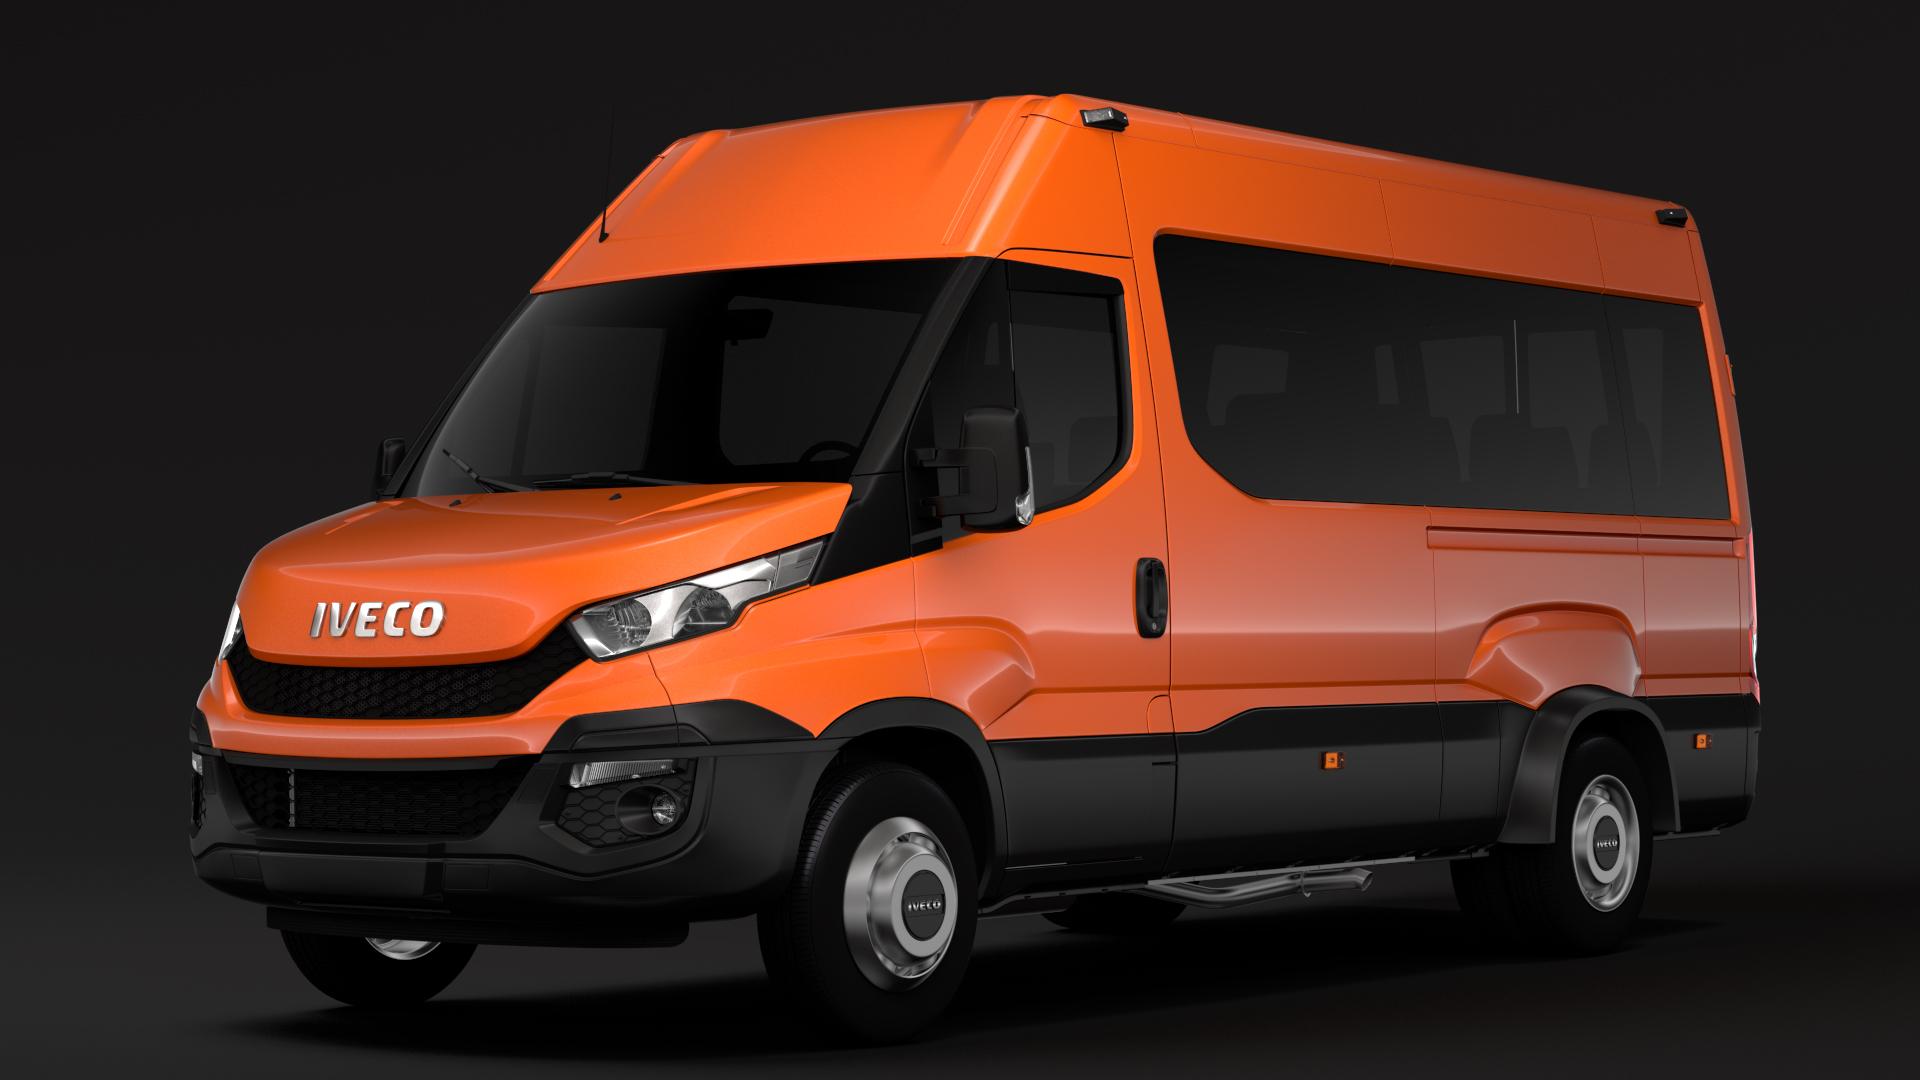 iveco daily minibus l3h2 2014-2016 3d model max fbx c4d lwo ma mb hrc xsi obj 276042